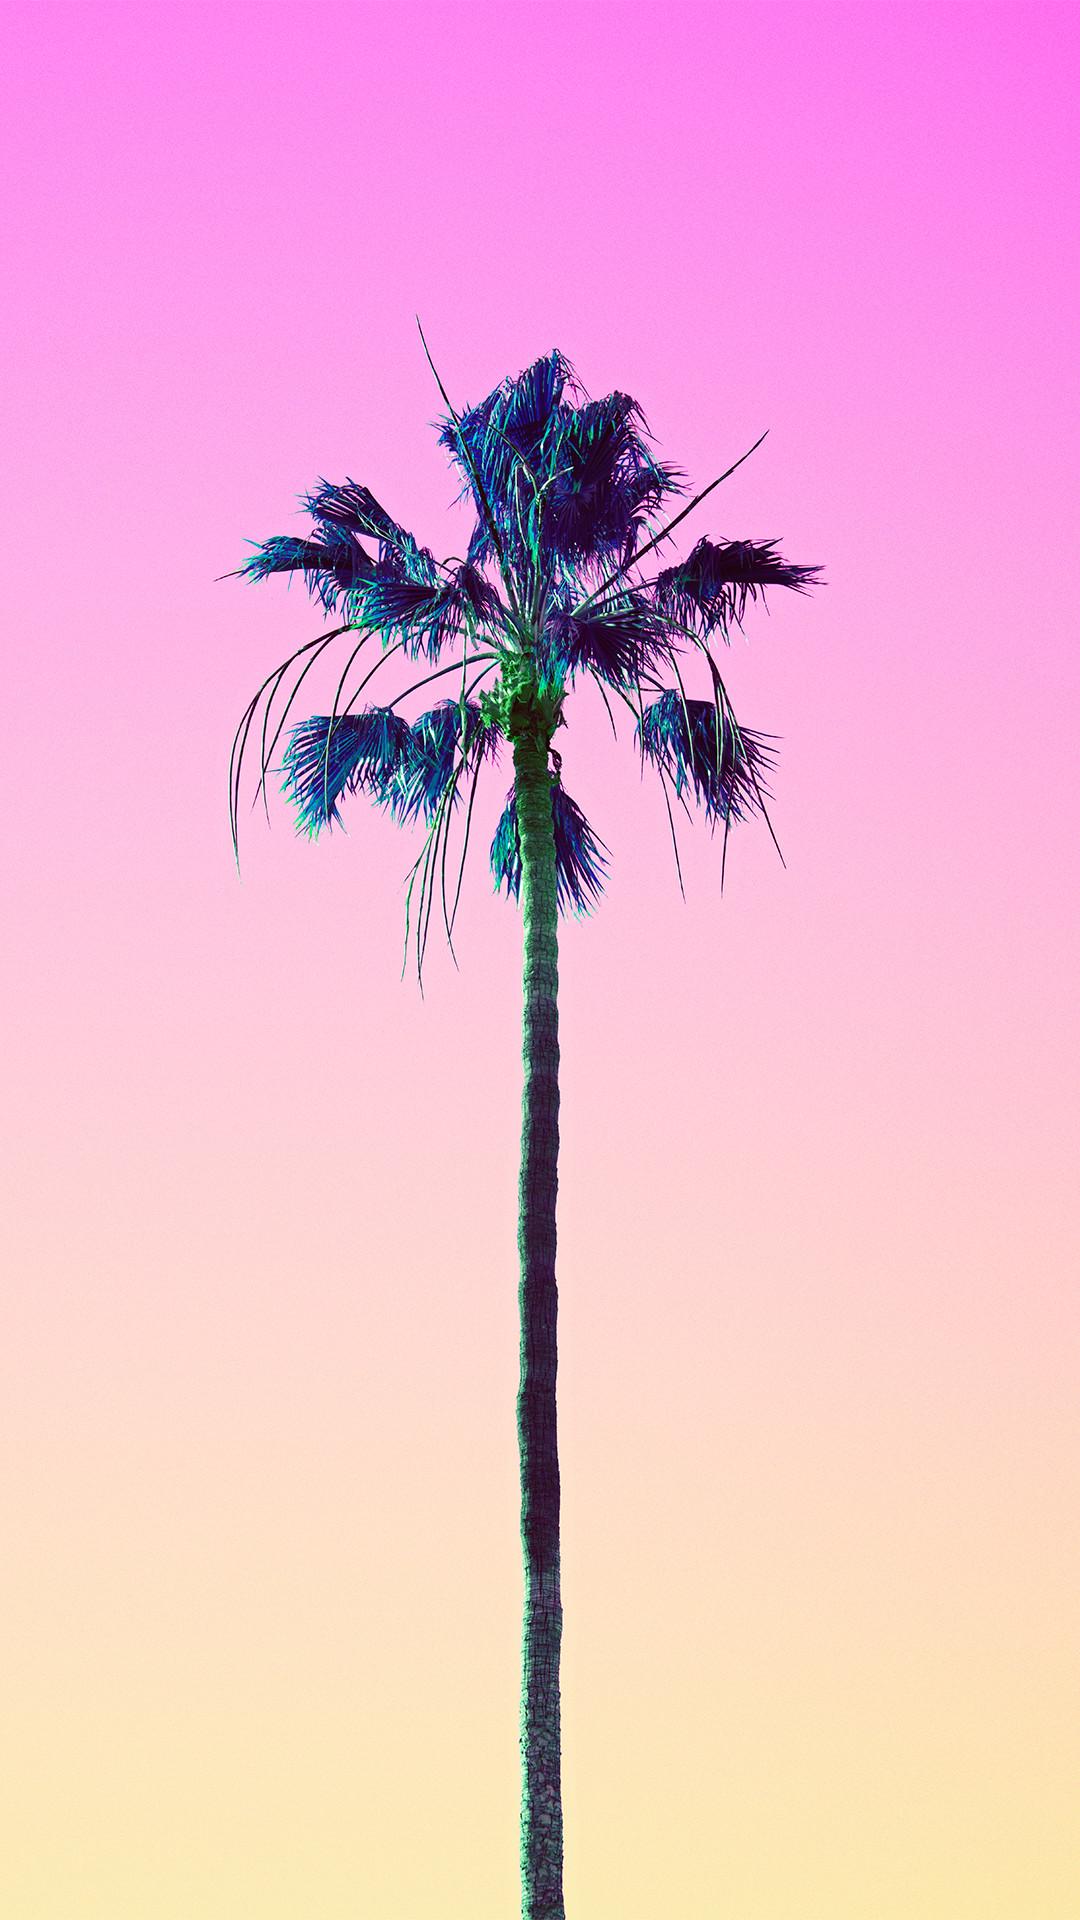 Data-src - Phone Backgrounds Palm Trees - HD Wallpaper